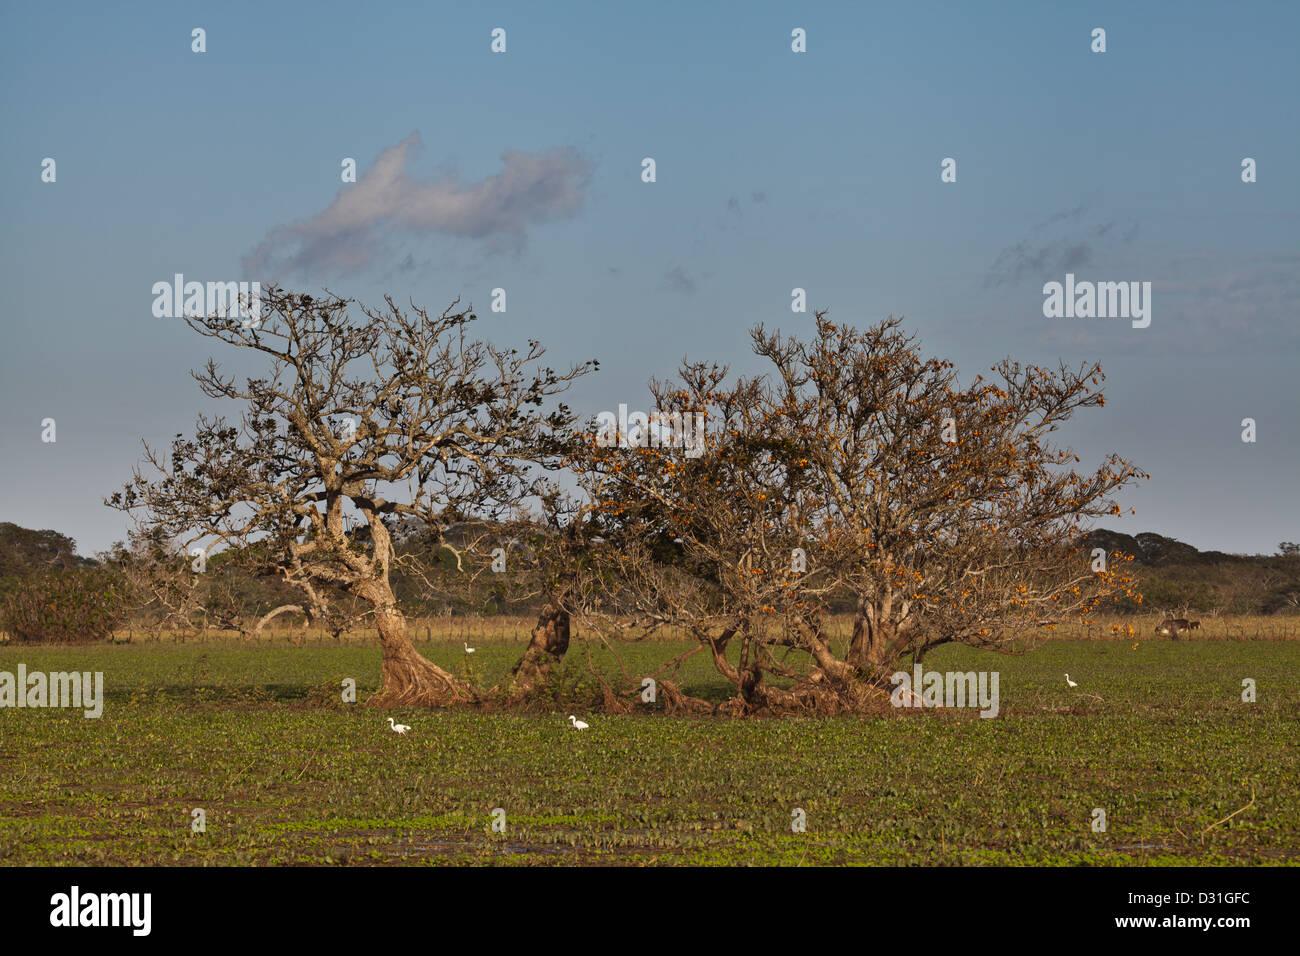 Trees in the Cienagas las Macanas wetlands, Herrera province, Republic of Panama. Stock Photo